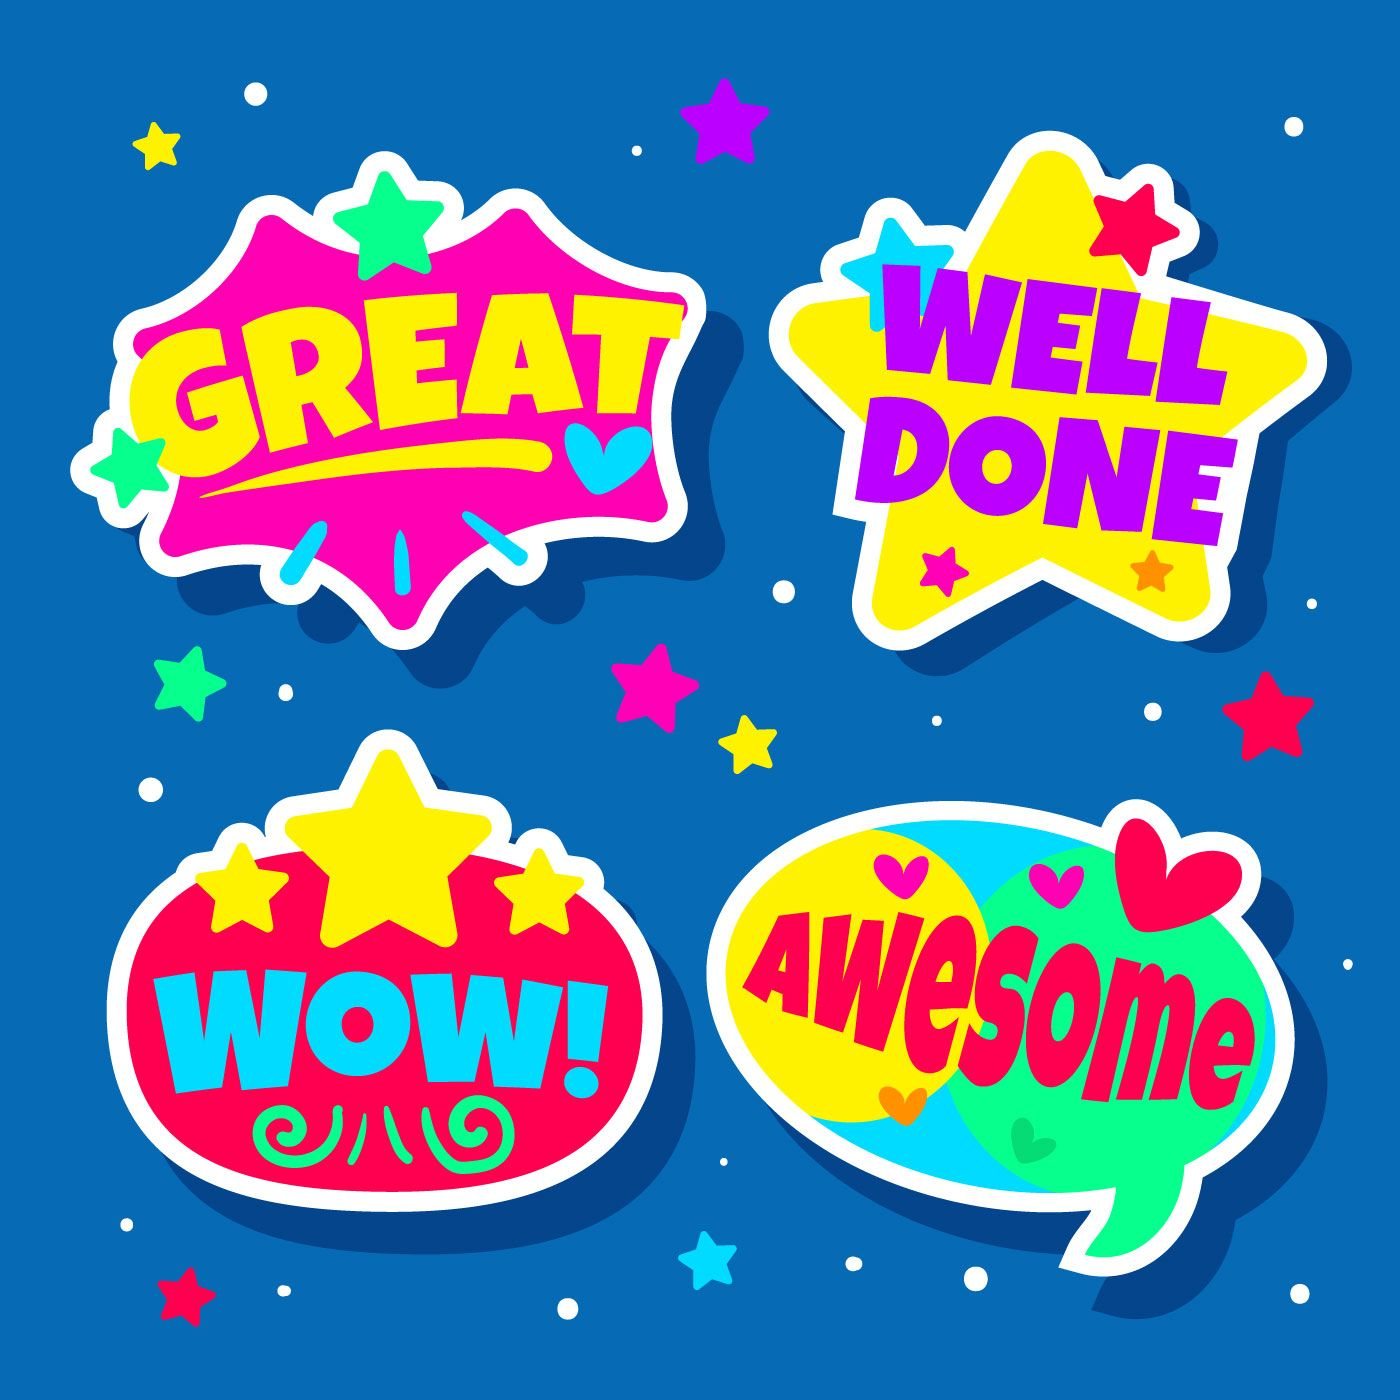 Download Teacher Reward Stickers Vector Art Choose From Over A Million Free Vectors Clipart Graphics Vector Ar Reward Stickers Teacher Stickers Kids Rewards